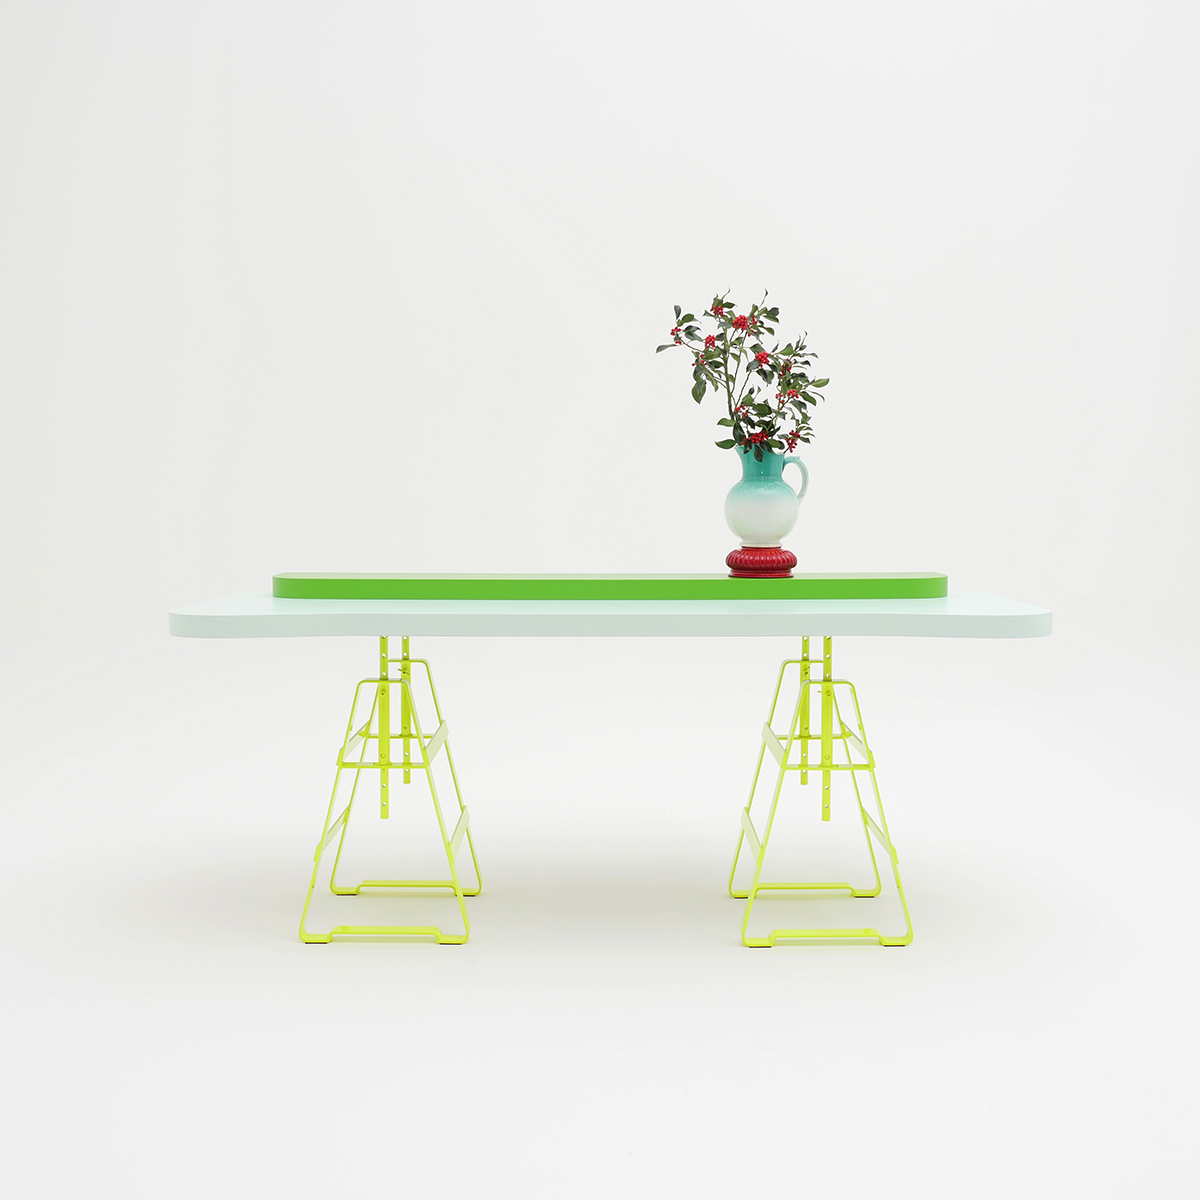 Lackaffe-Atelierhaussmann- neon